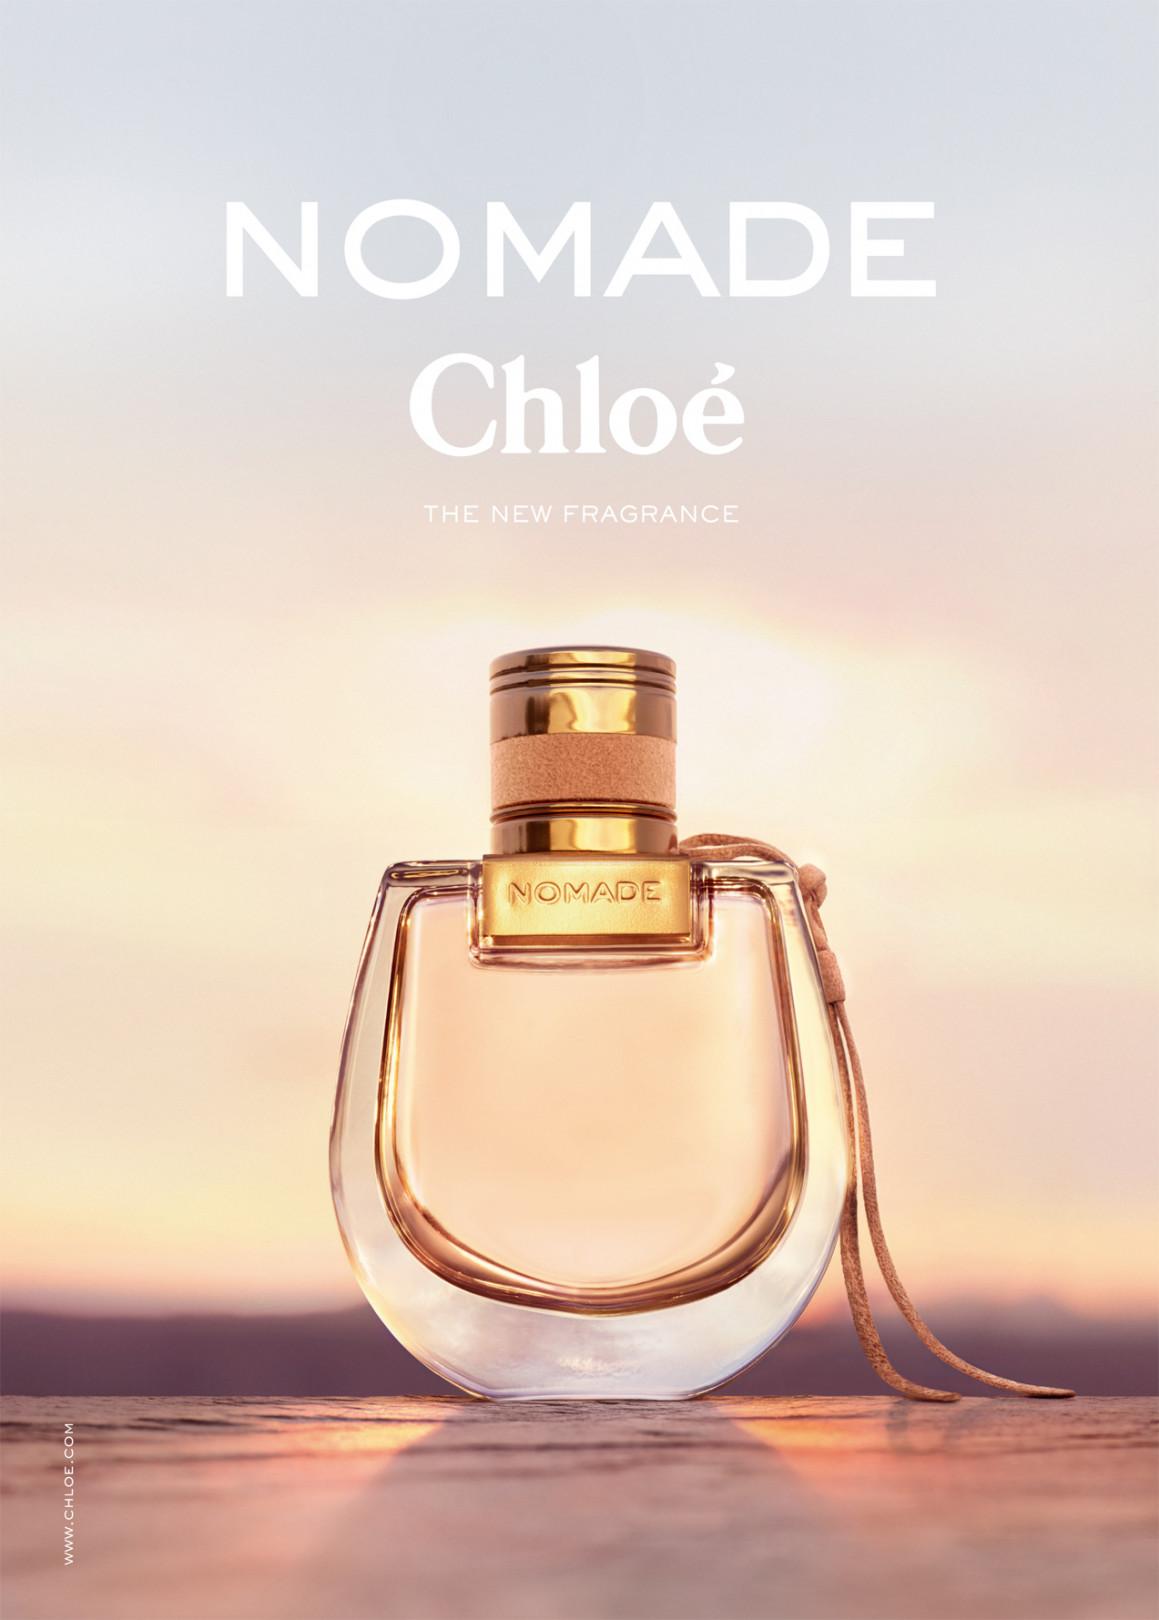 Nomade Chloe perfume - a new fragrance for women 2018